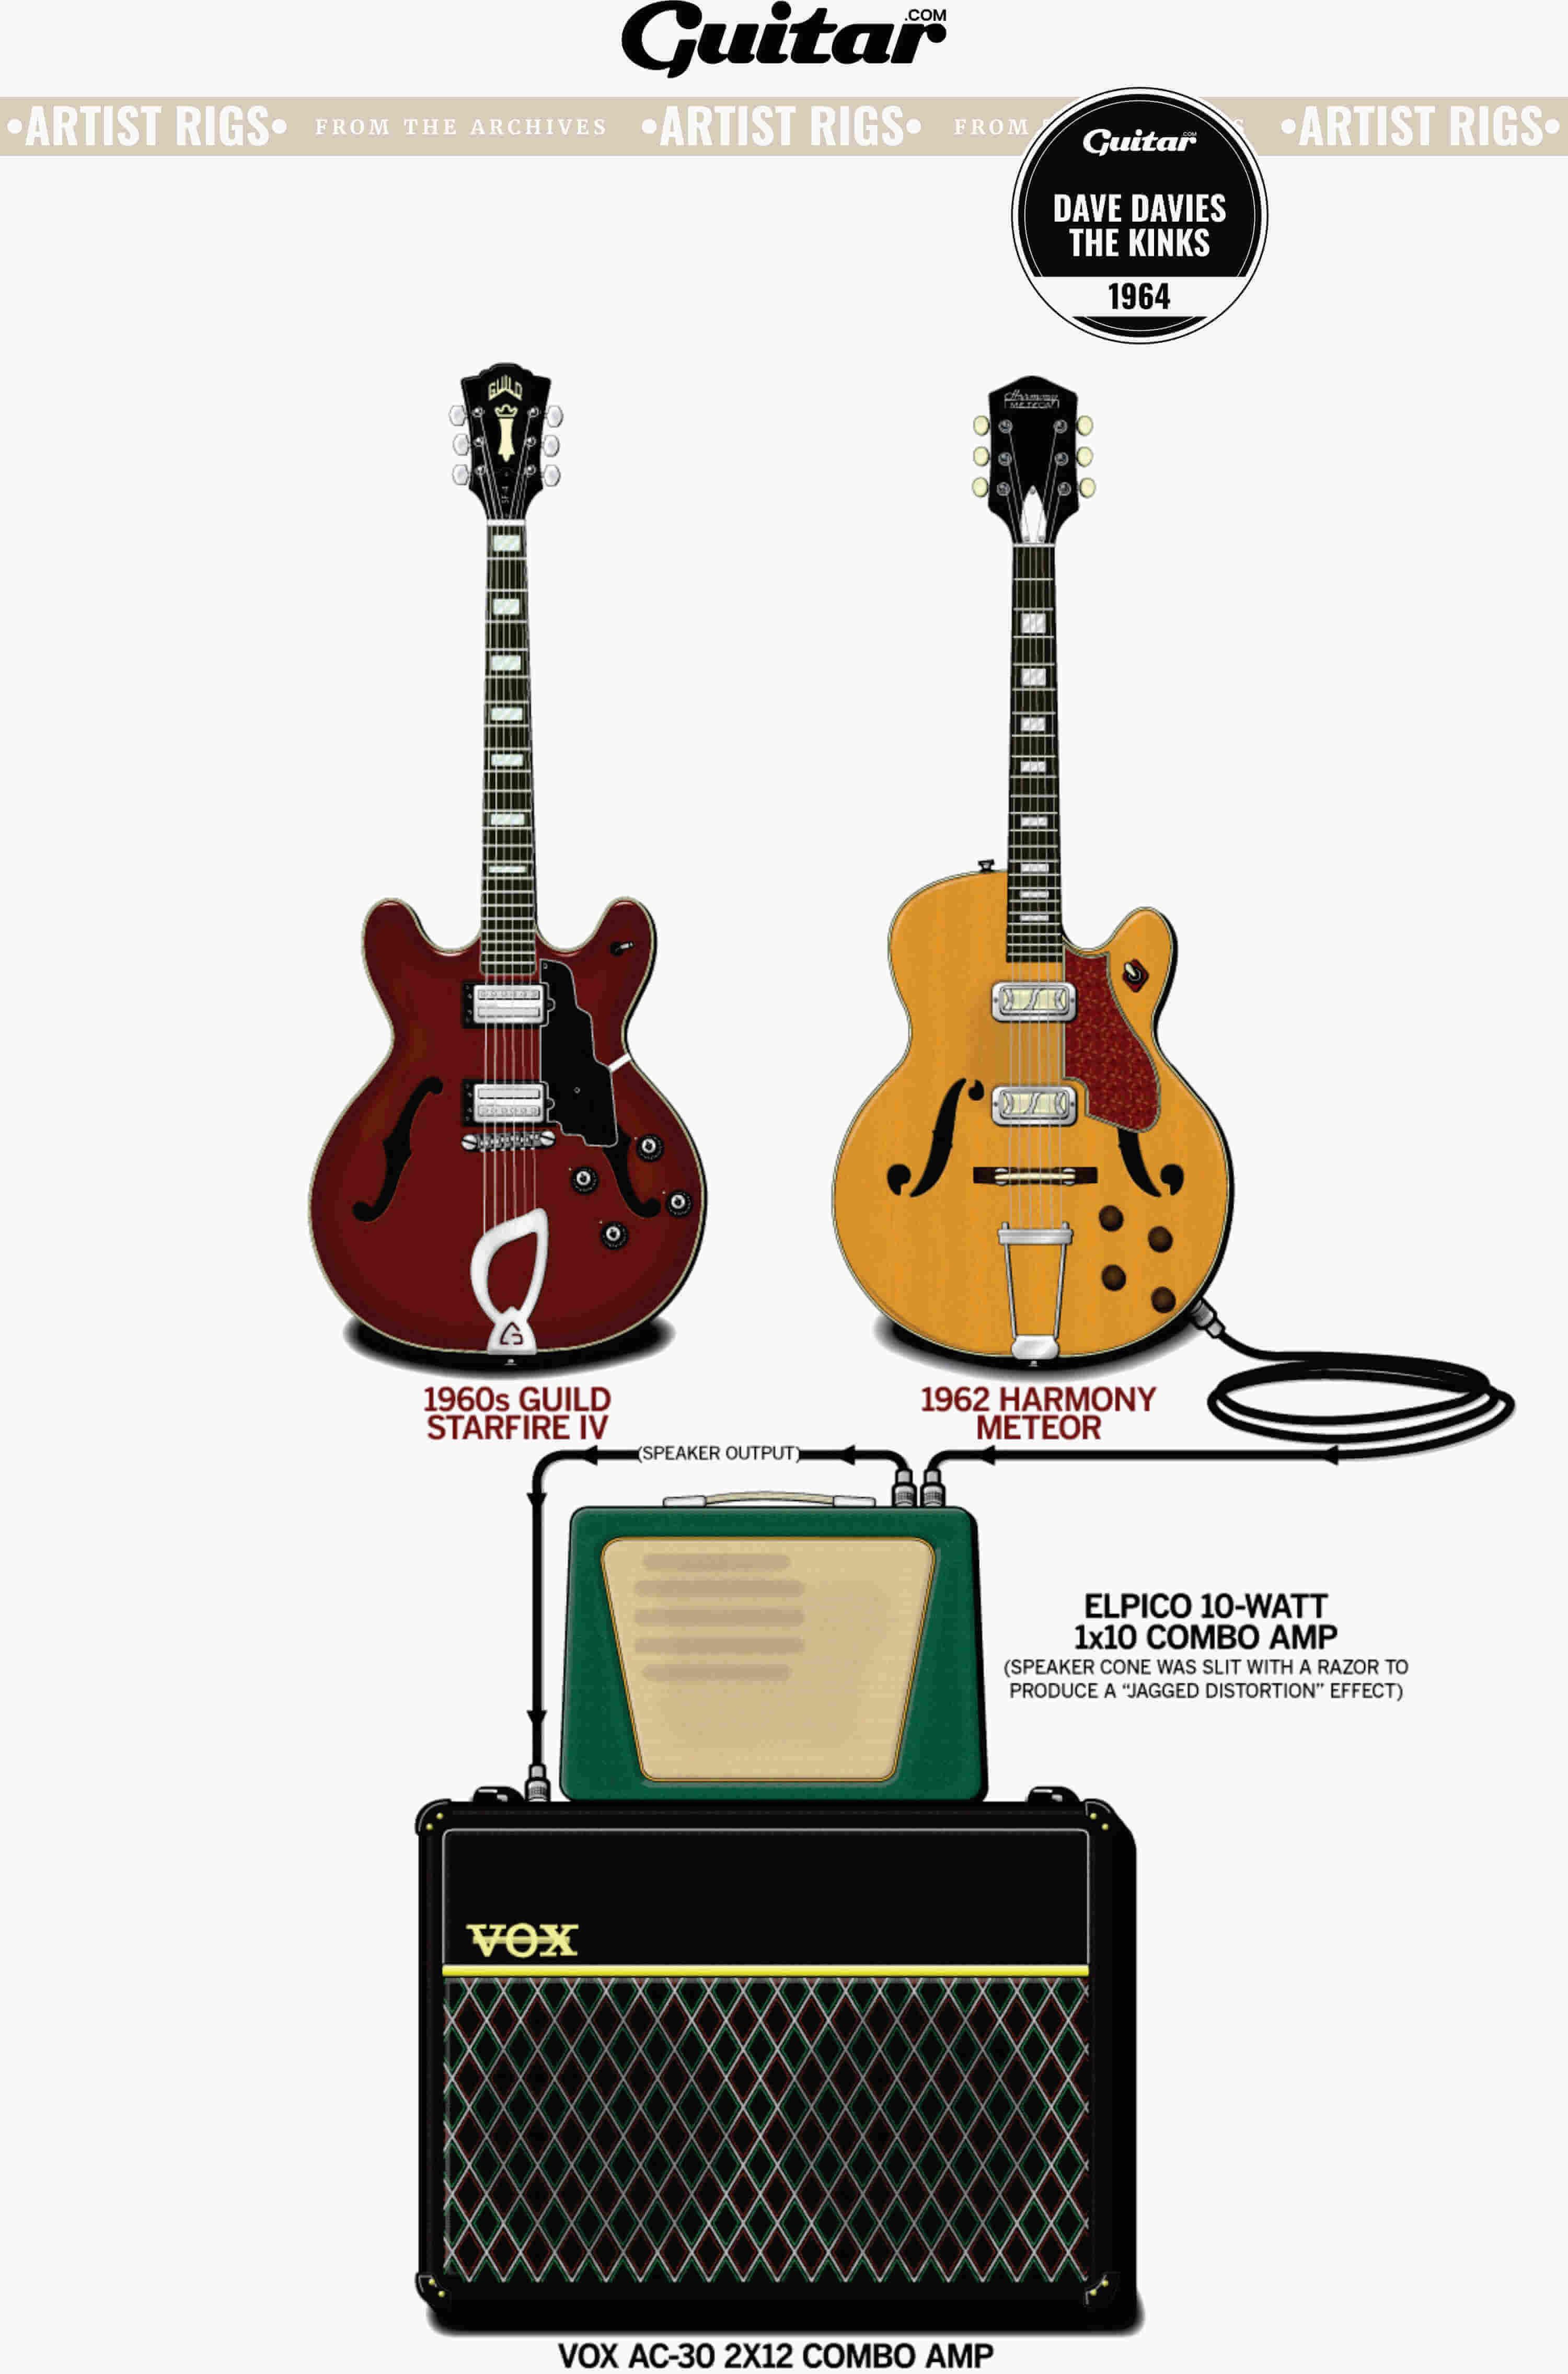 Rig Diagram: Dave Davies, The Kinks (1964)